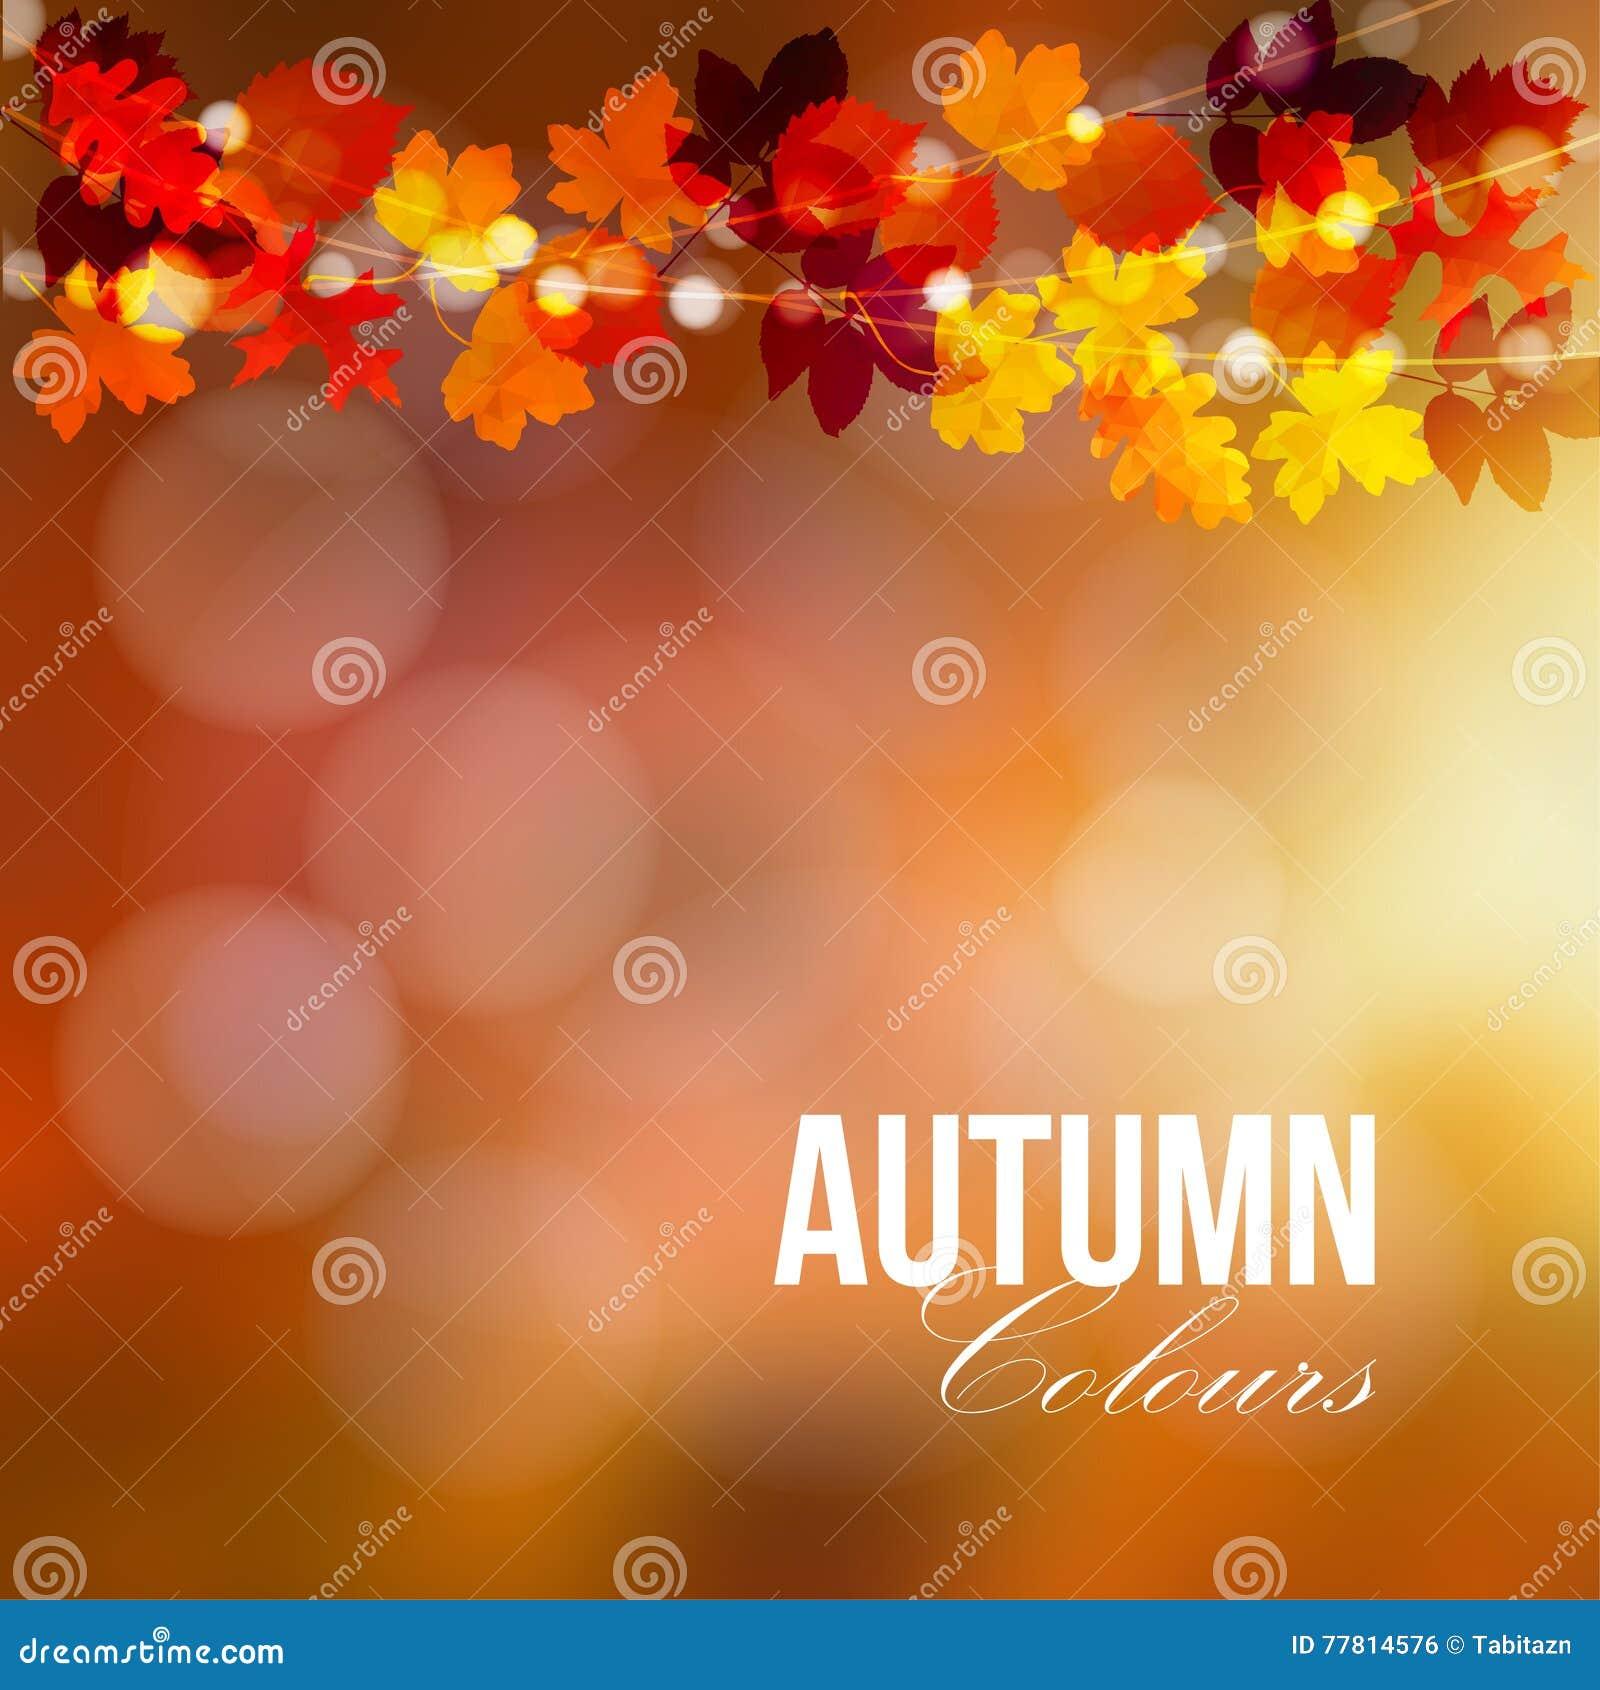 Autumn, fall card, banner. Garden party decoration. String of polygonal oak, maple leaves, lights. Modern illustration